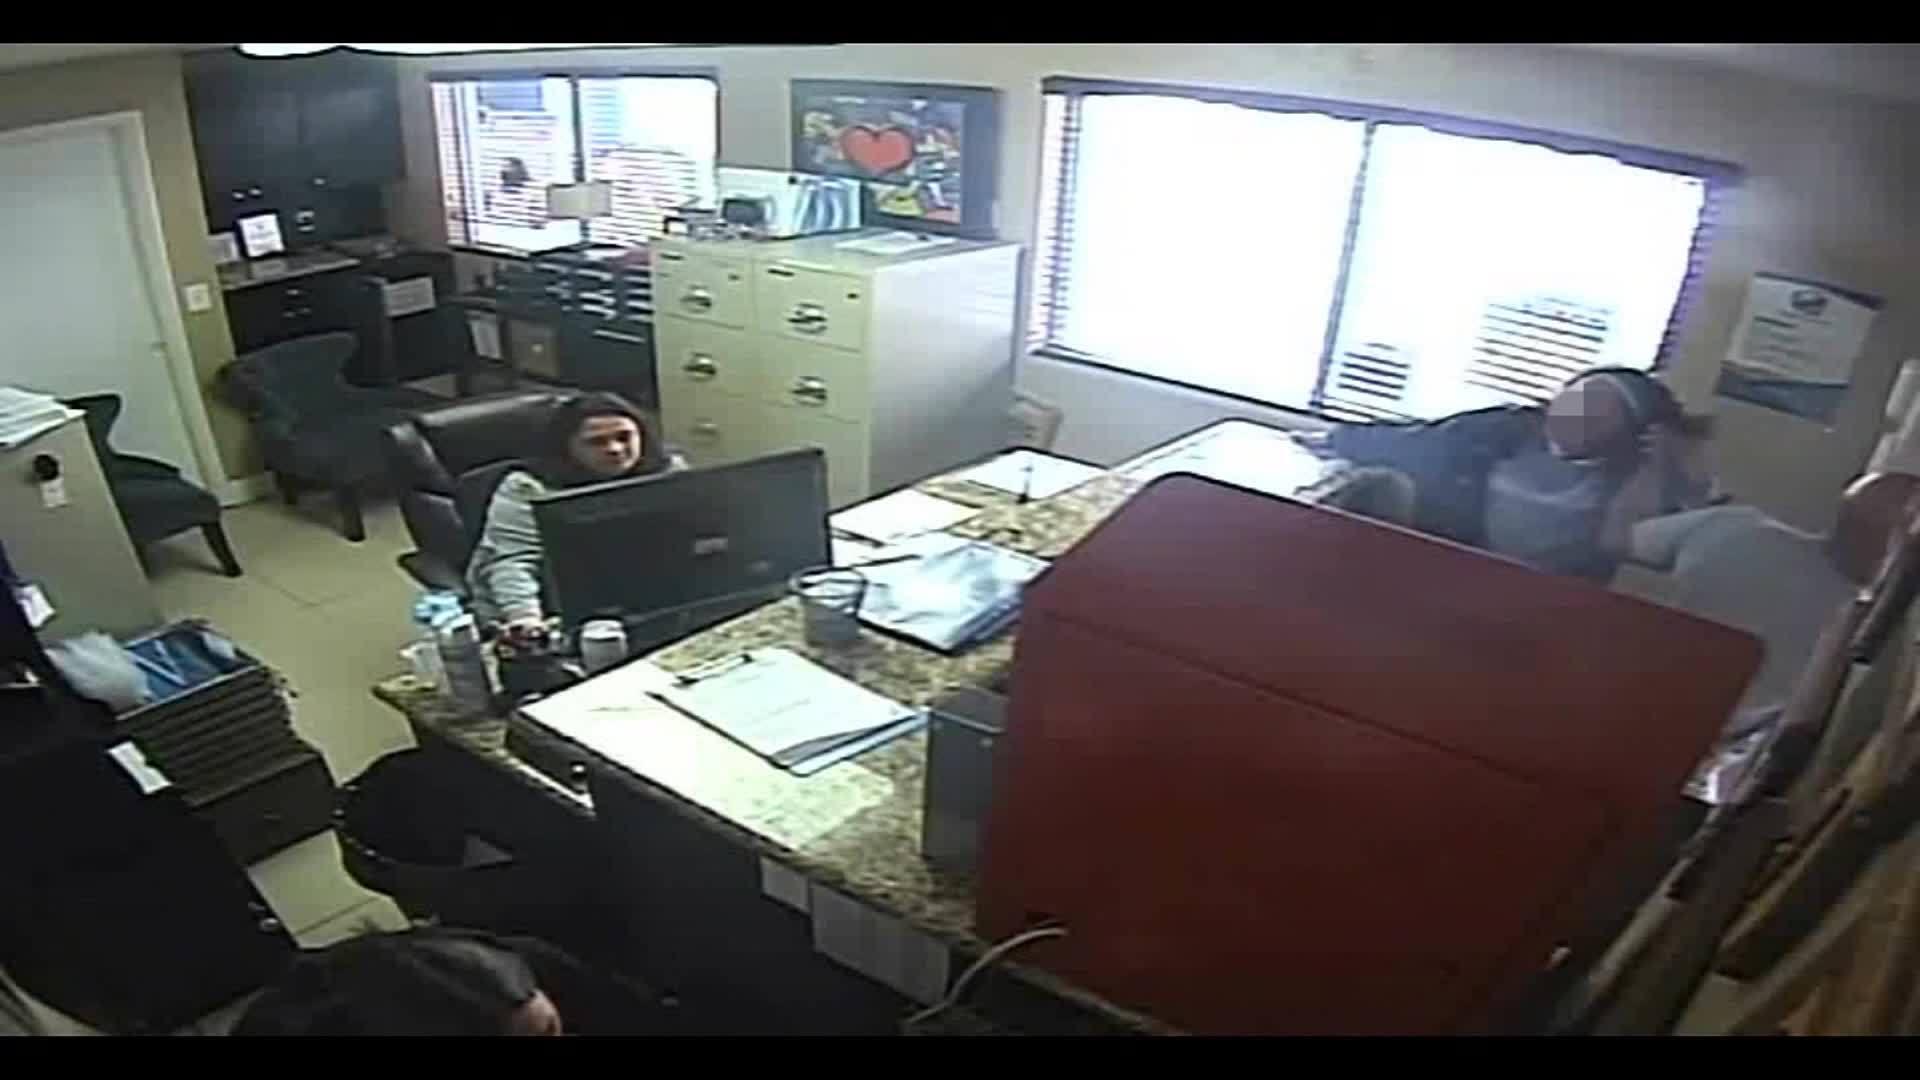 Florida cop beats daughter in school office as employees watch